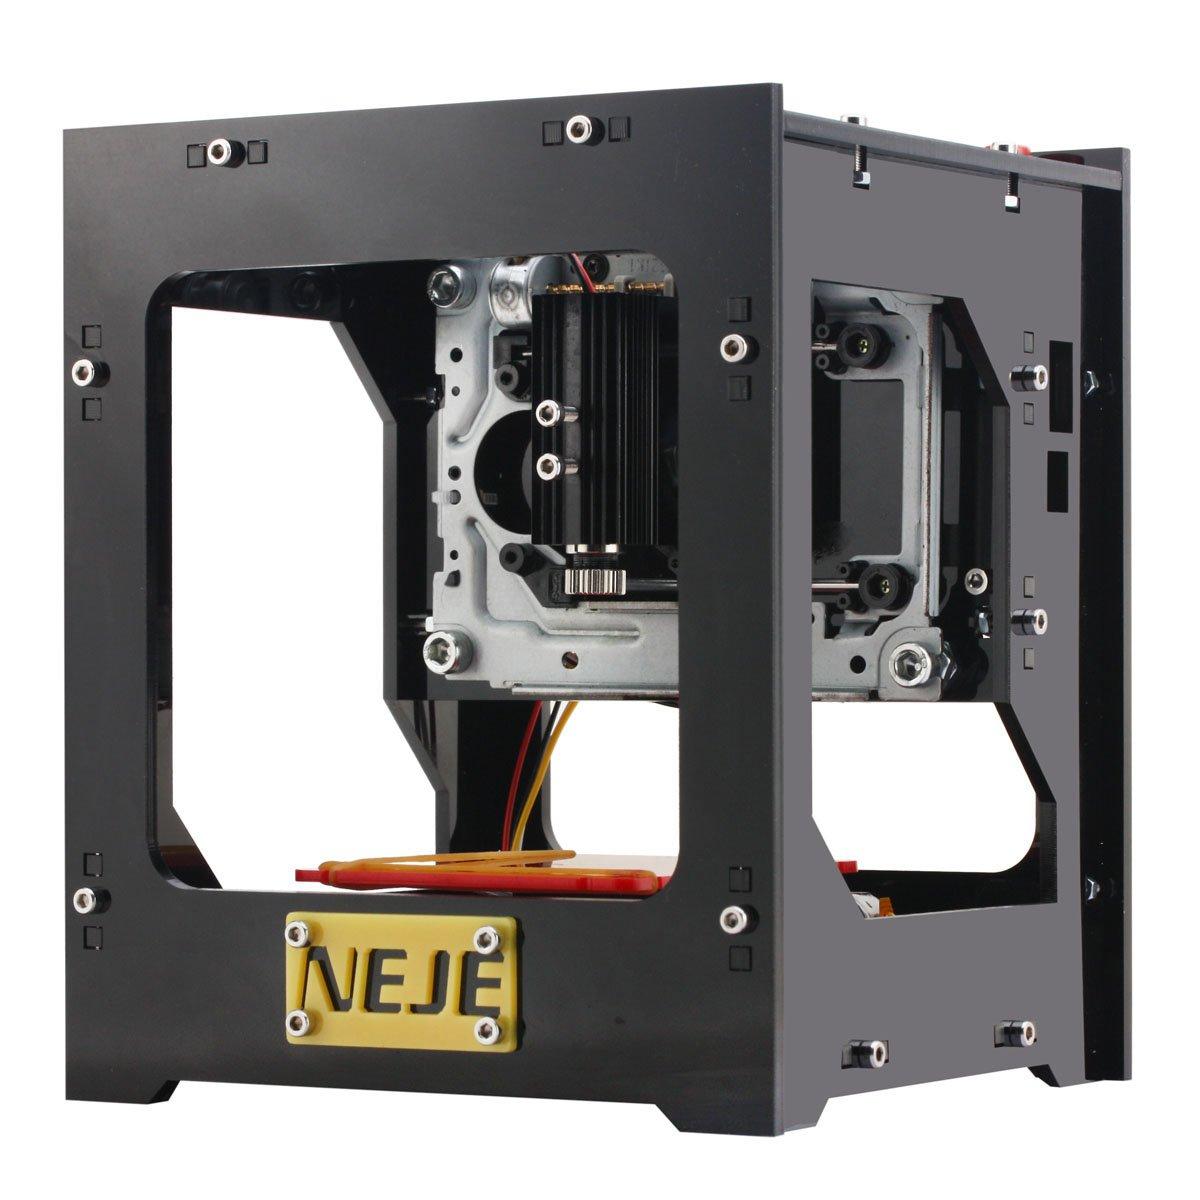 Yosoo 1000mW DIY USB Laser CNC Engraver Printer Cutter Engraving Machine NEJE DK-8-KZ M2U8 for Leather Wood Plastic